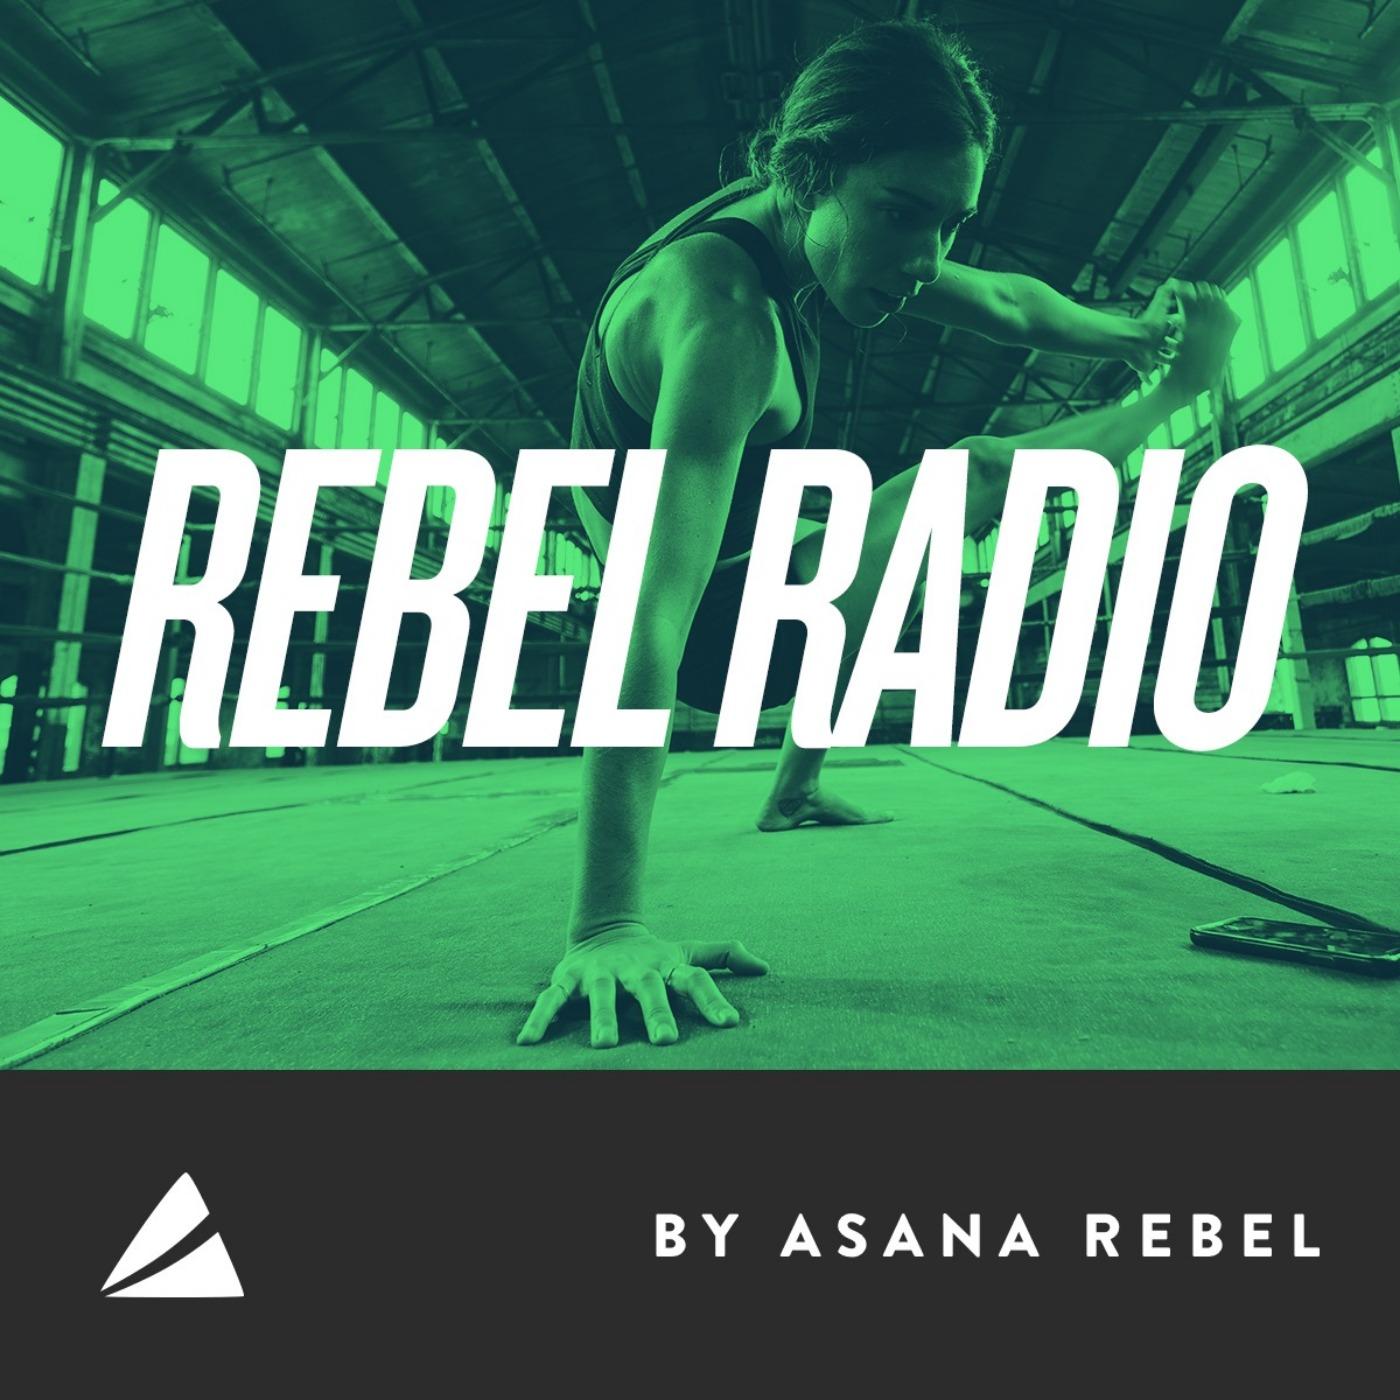 rebel radio podcast listen